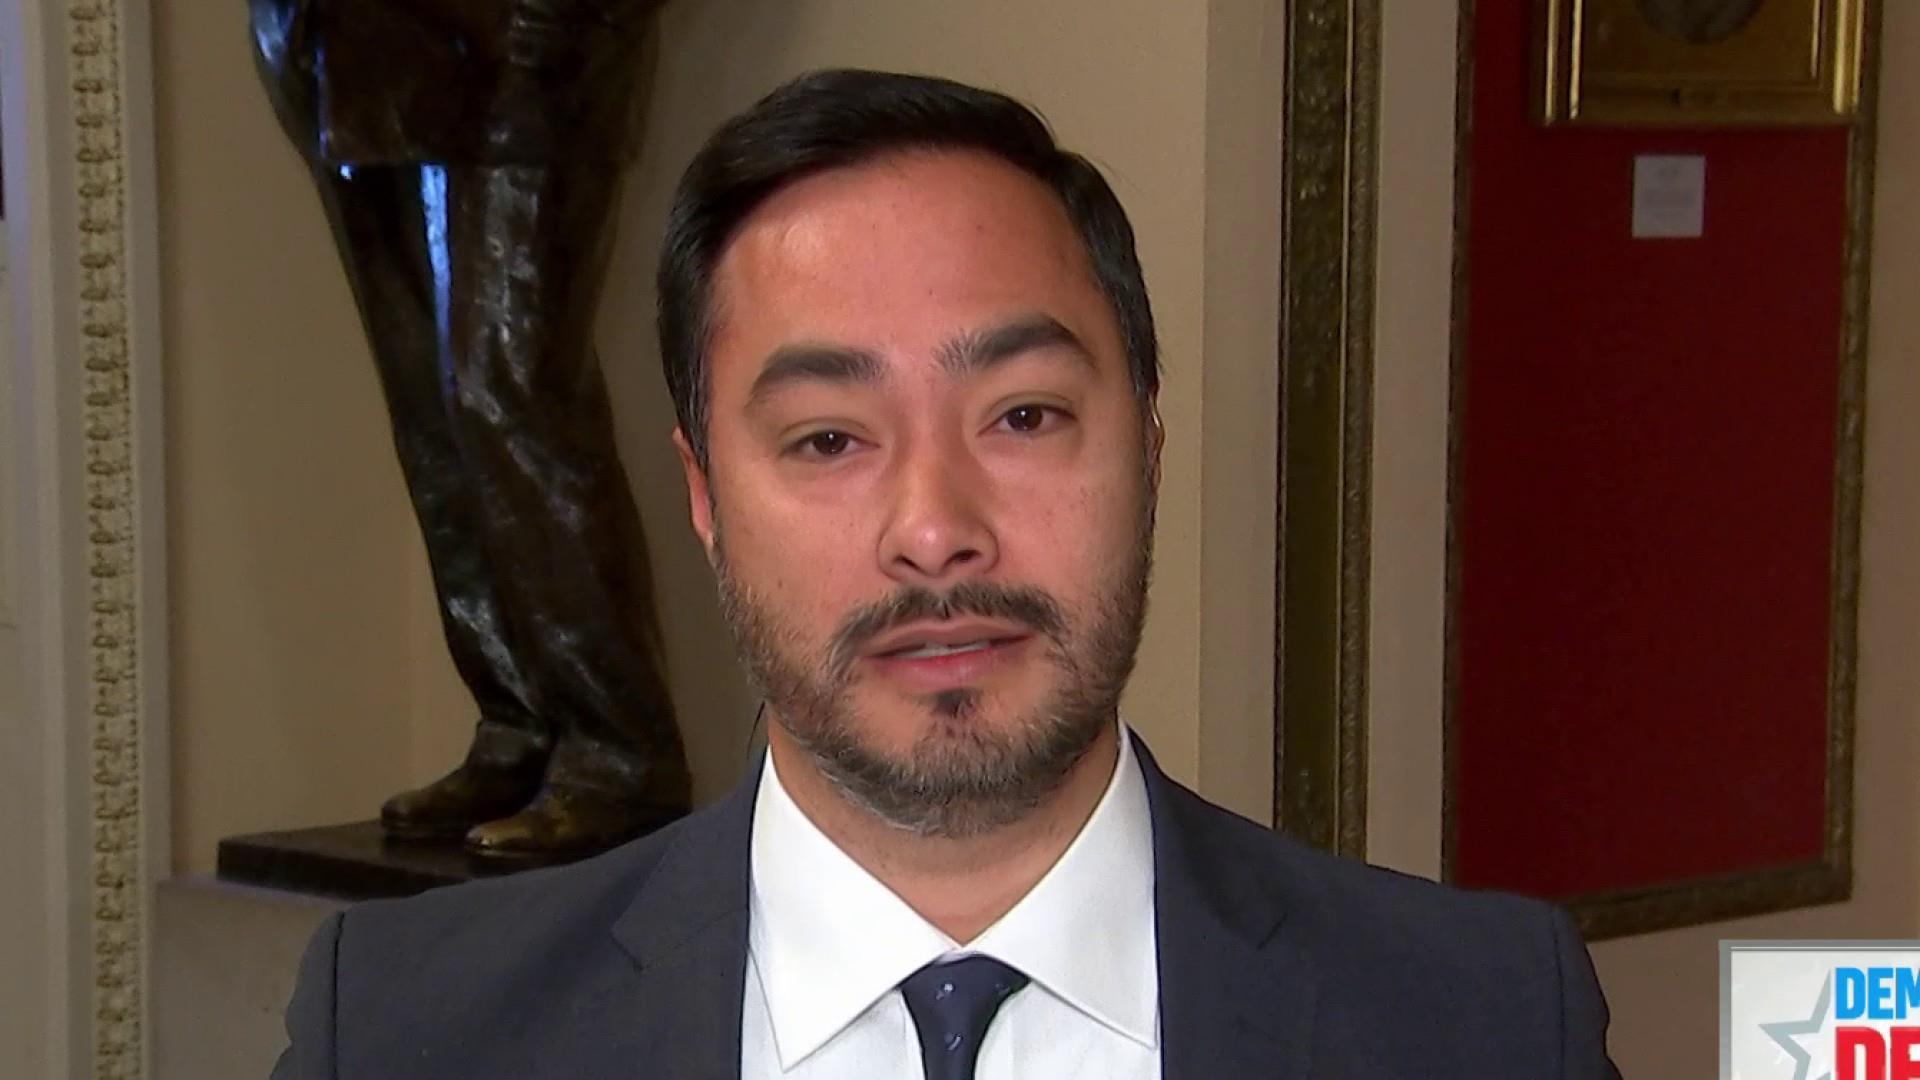 House Intel member looks ahead to Friday, next week